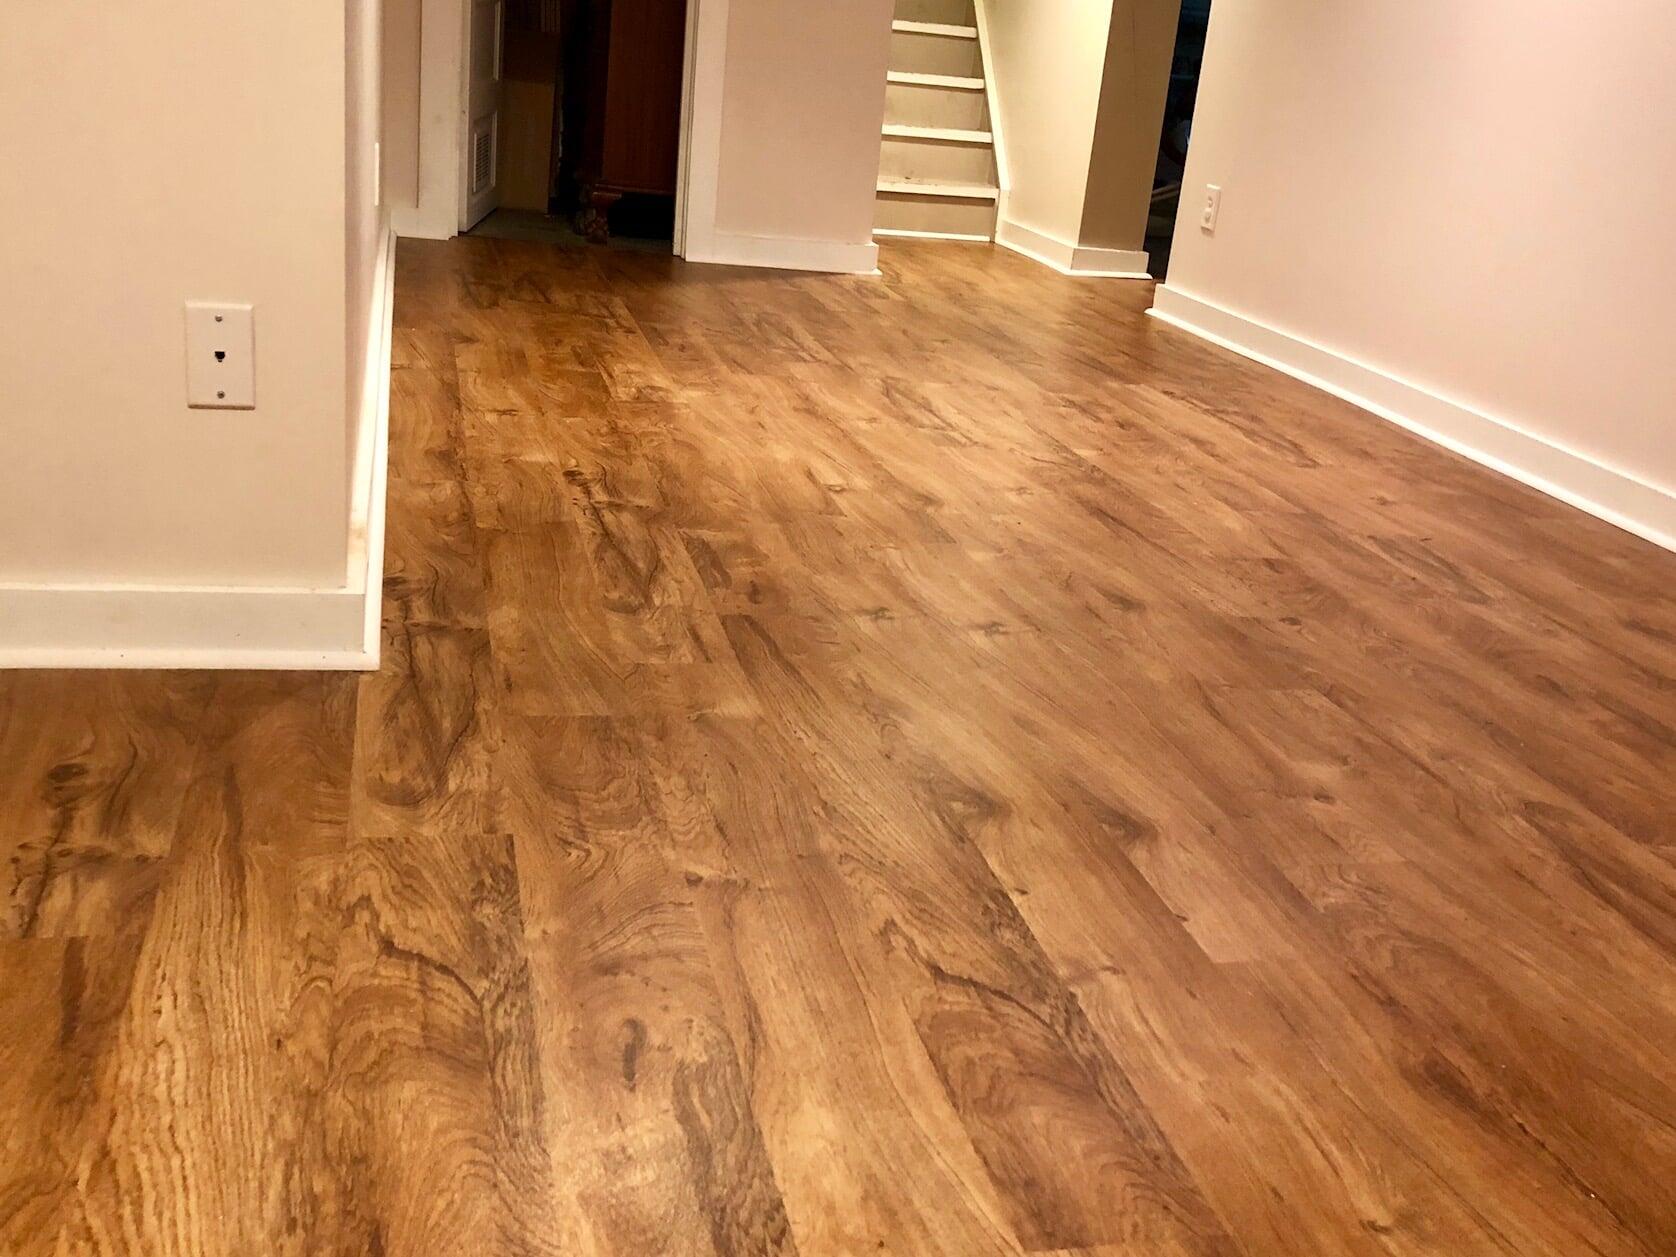 Luxury vinyl plank flooring from Emerald Installation in King County, WA